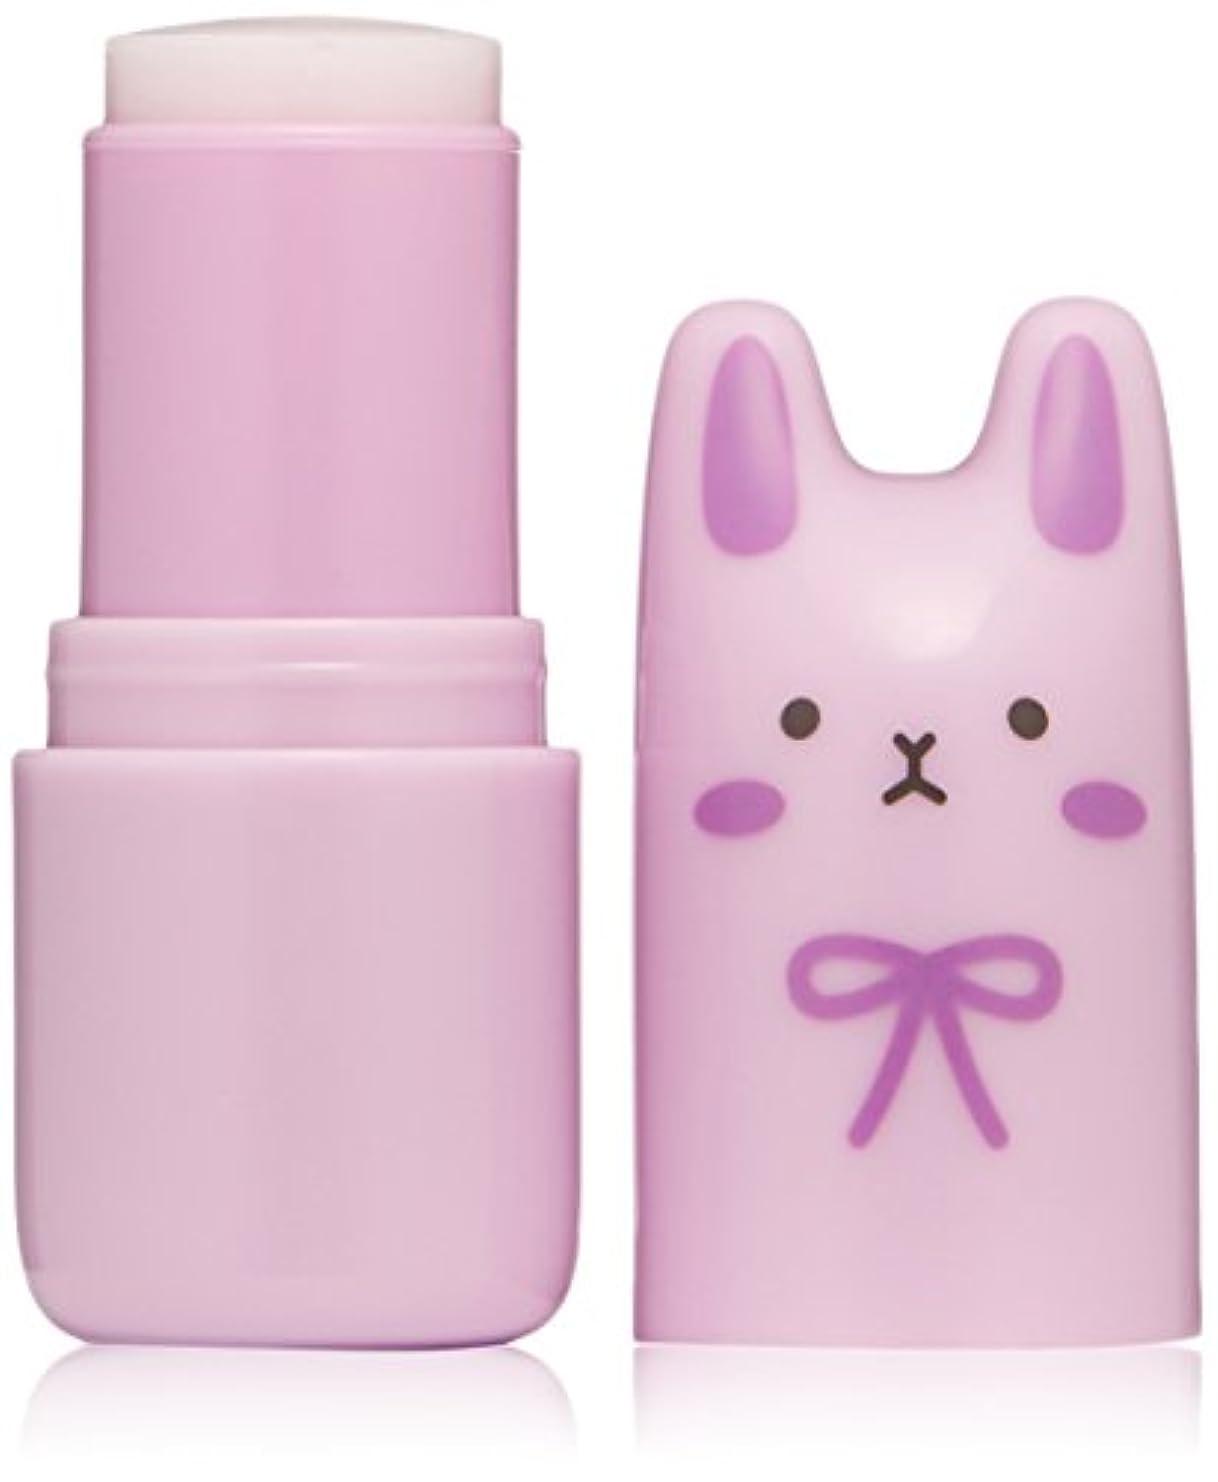 TONYMOLY Pocket Bunny Perfume Bar #03 Bloom Bunny/トニーモリー ポケット バニー パフュームバー #03 ブルームバニー